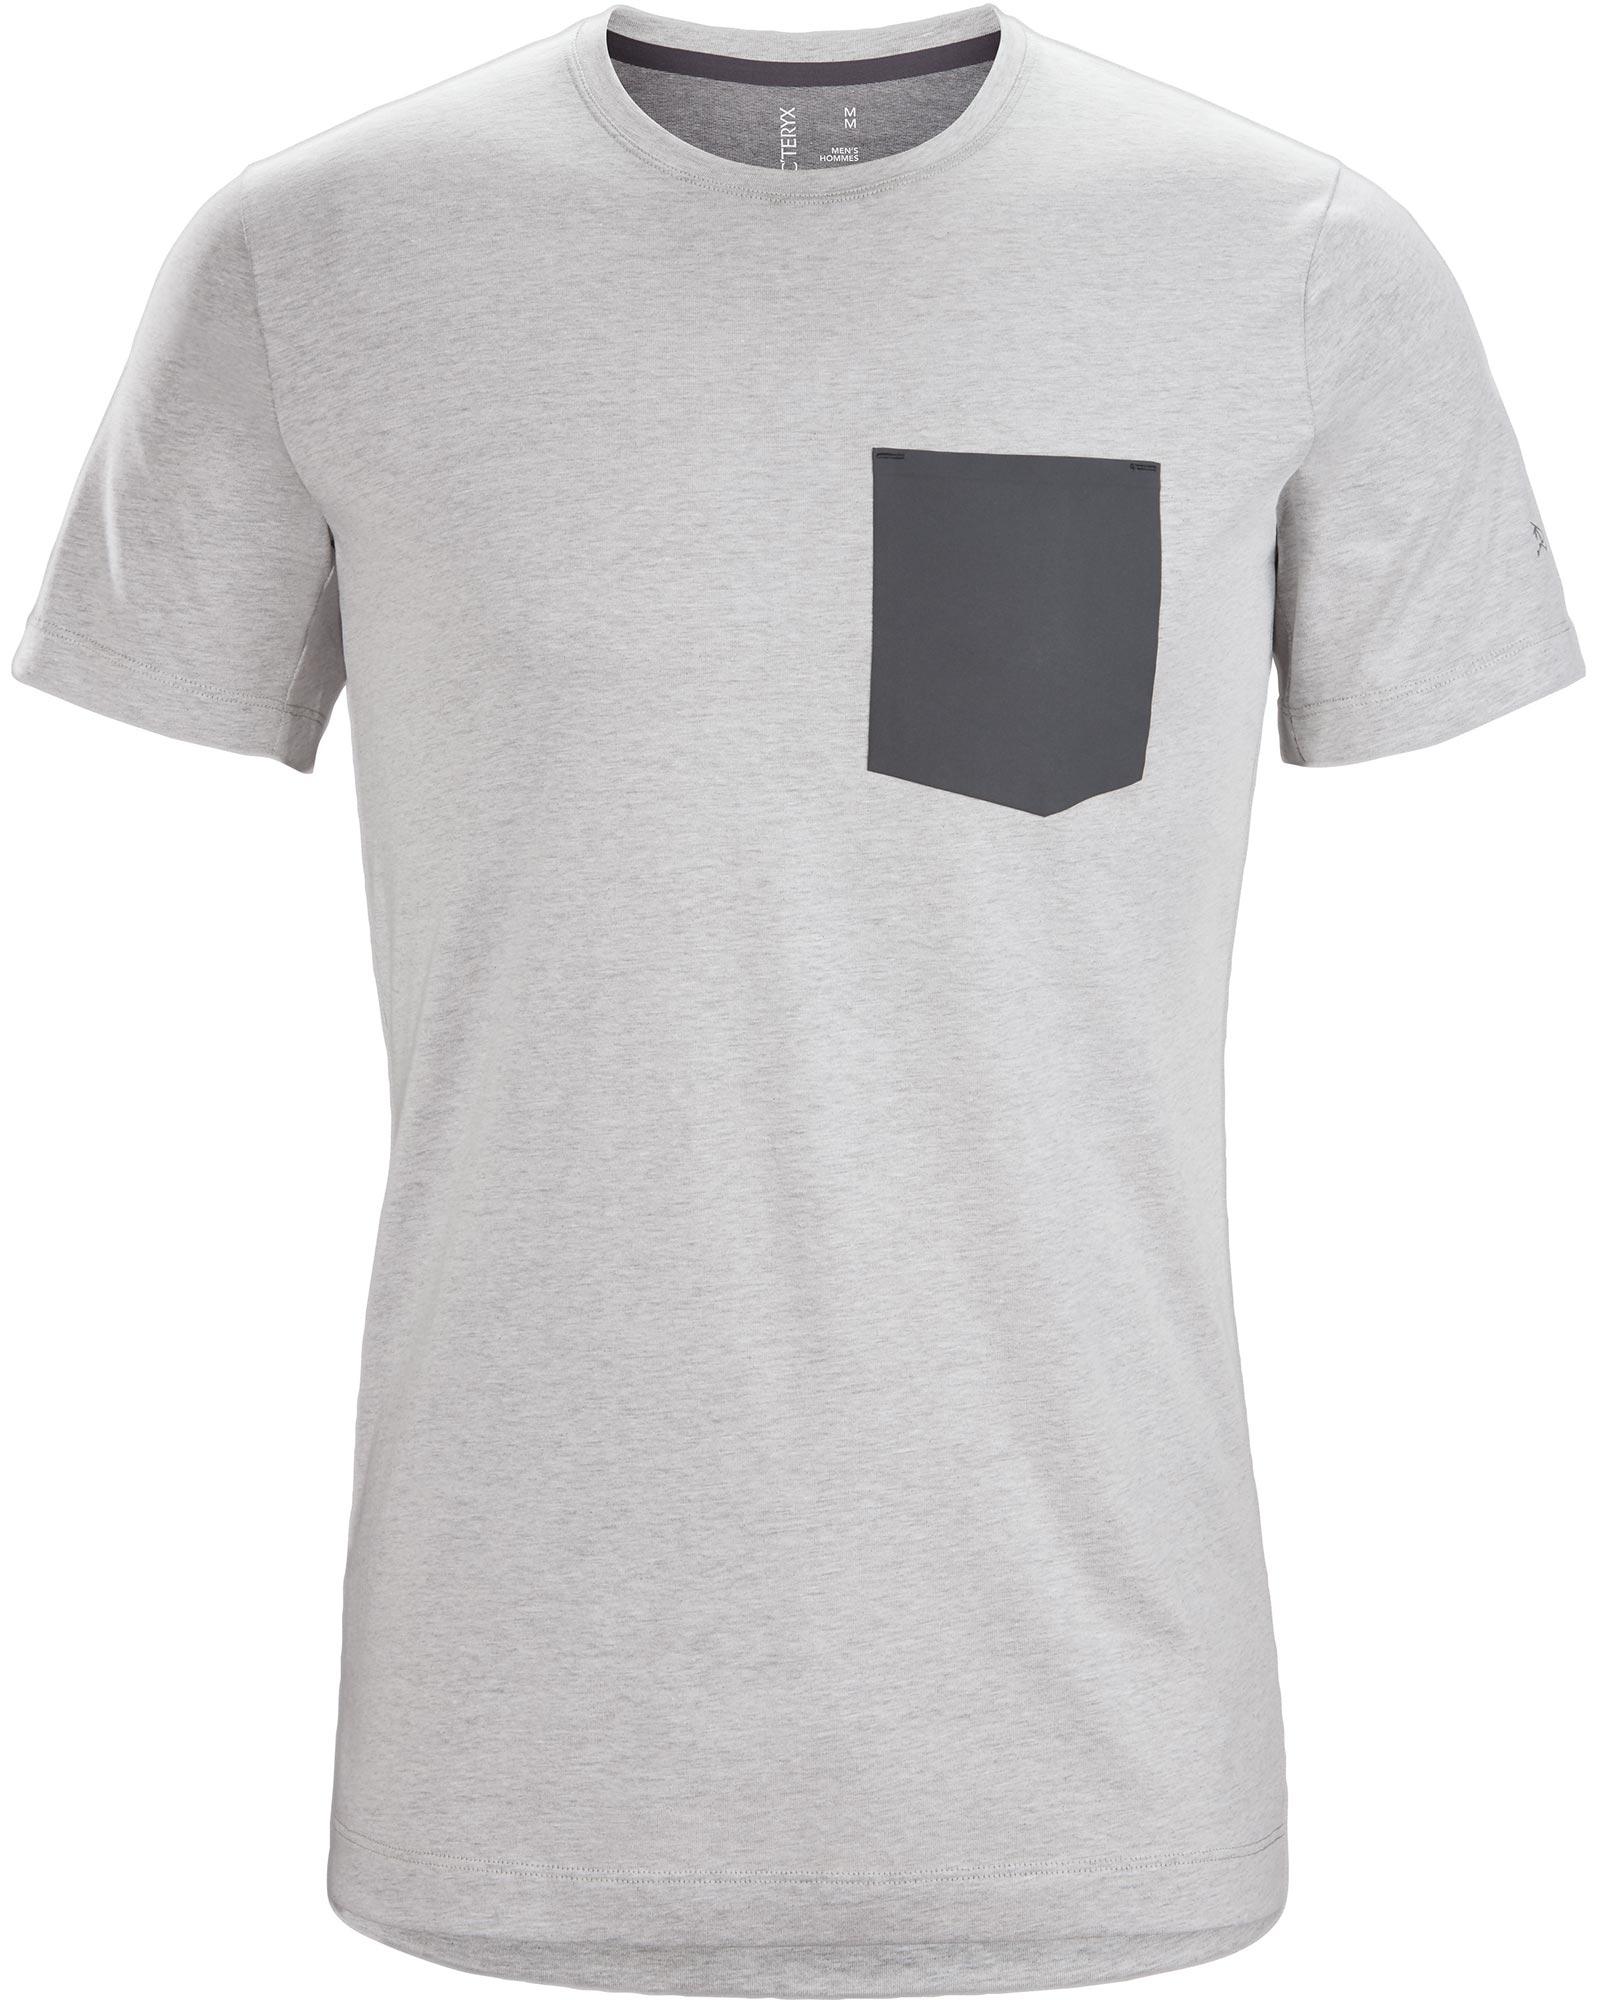 Arc'teryx Men's Eris Short Sleeve T-Shirt 0